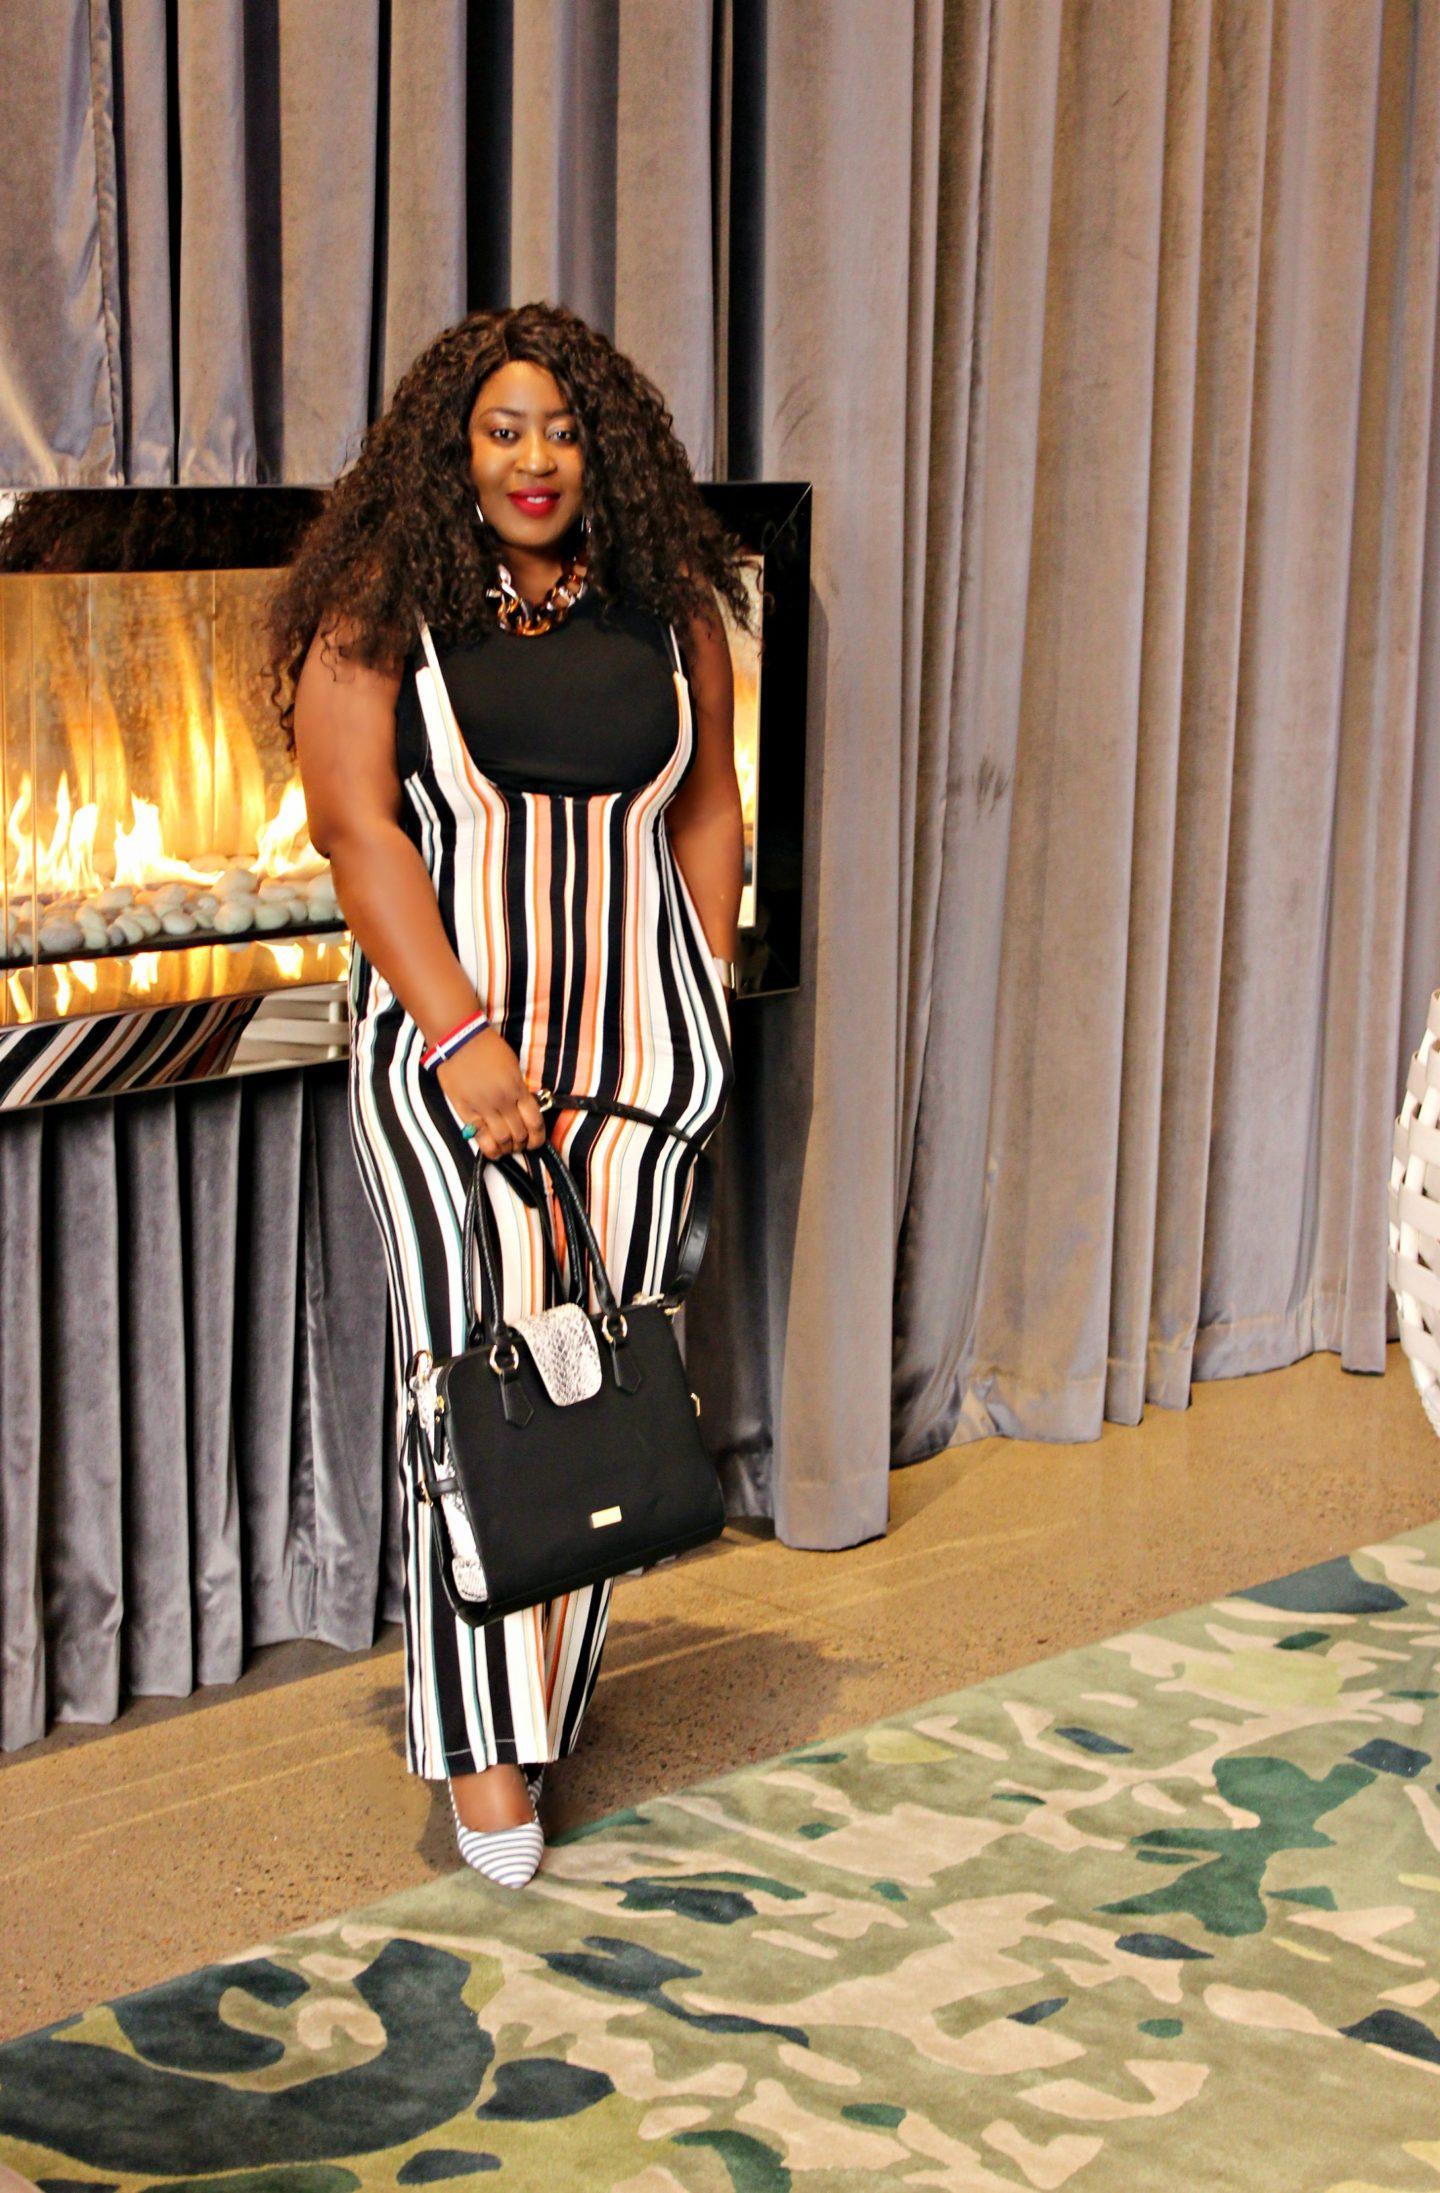 target-stye-jumpsuit-black-lifestyle-blogger